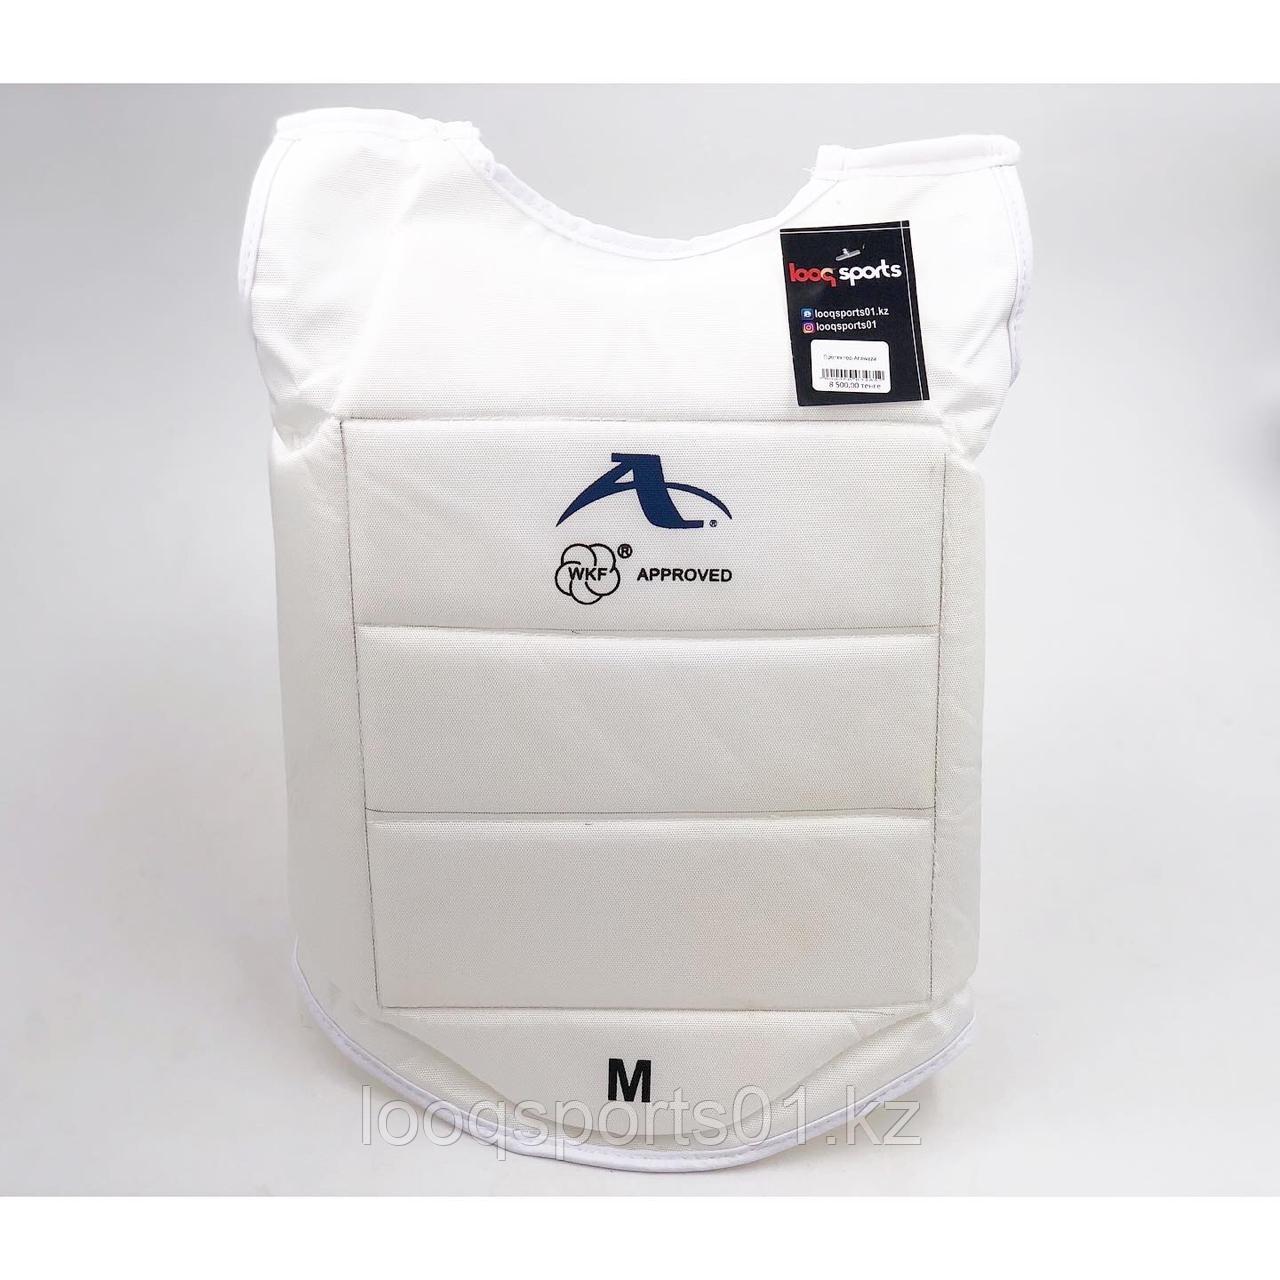 Защита корпуса Arawaza (протектор, жилеты) для каратэ карате